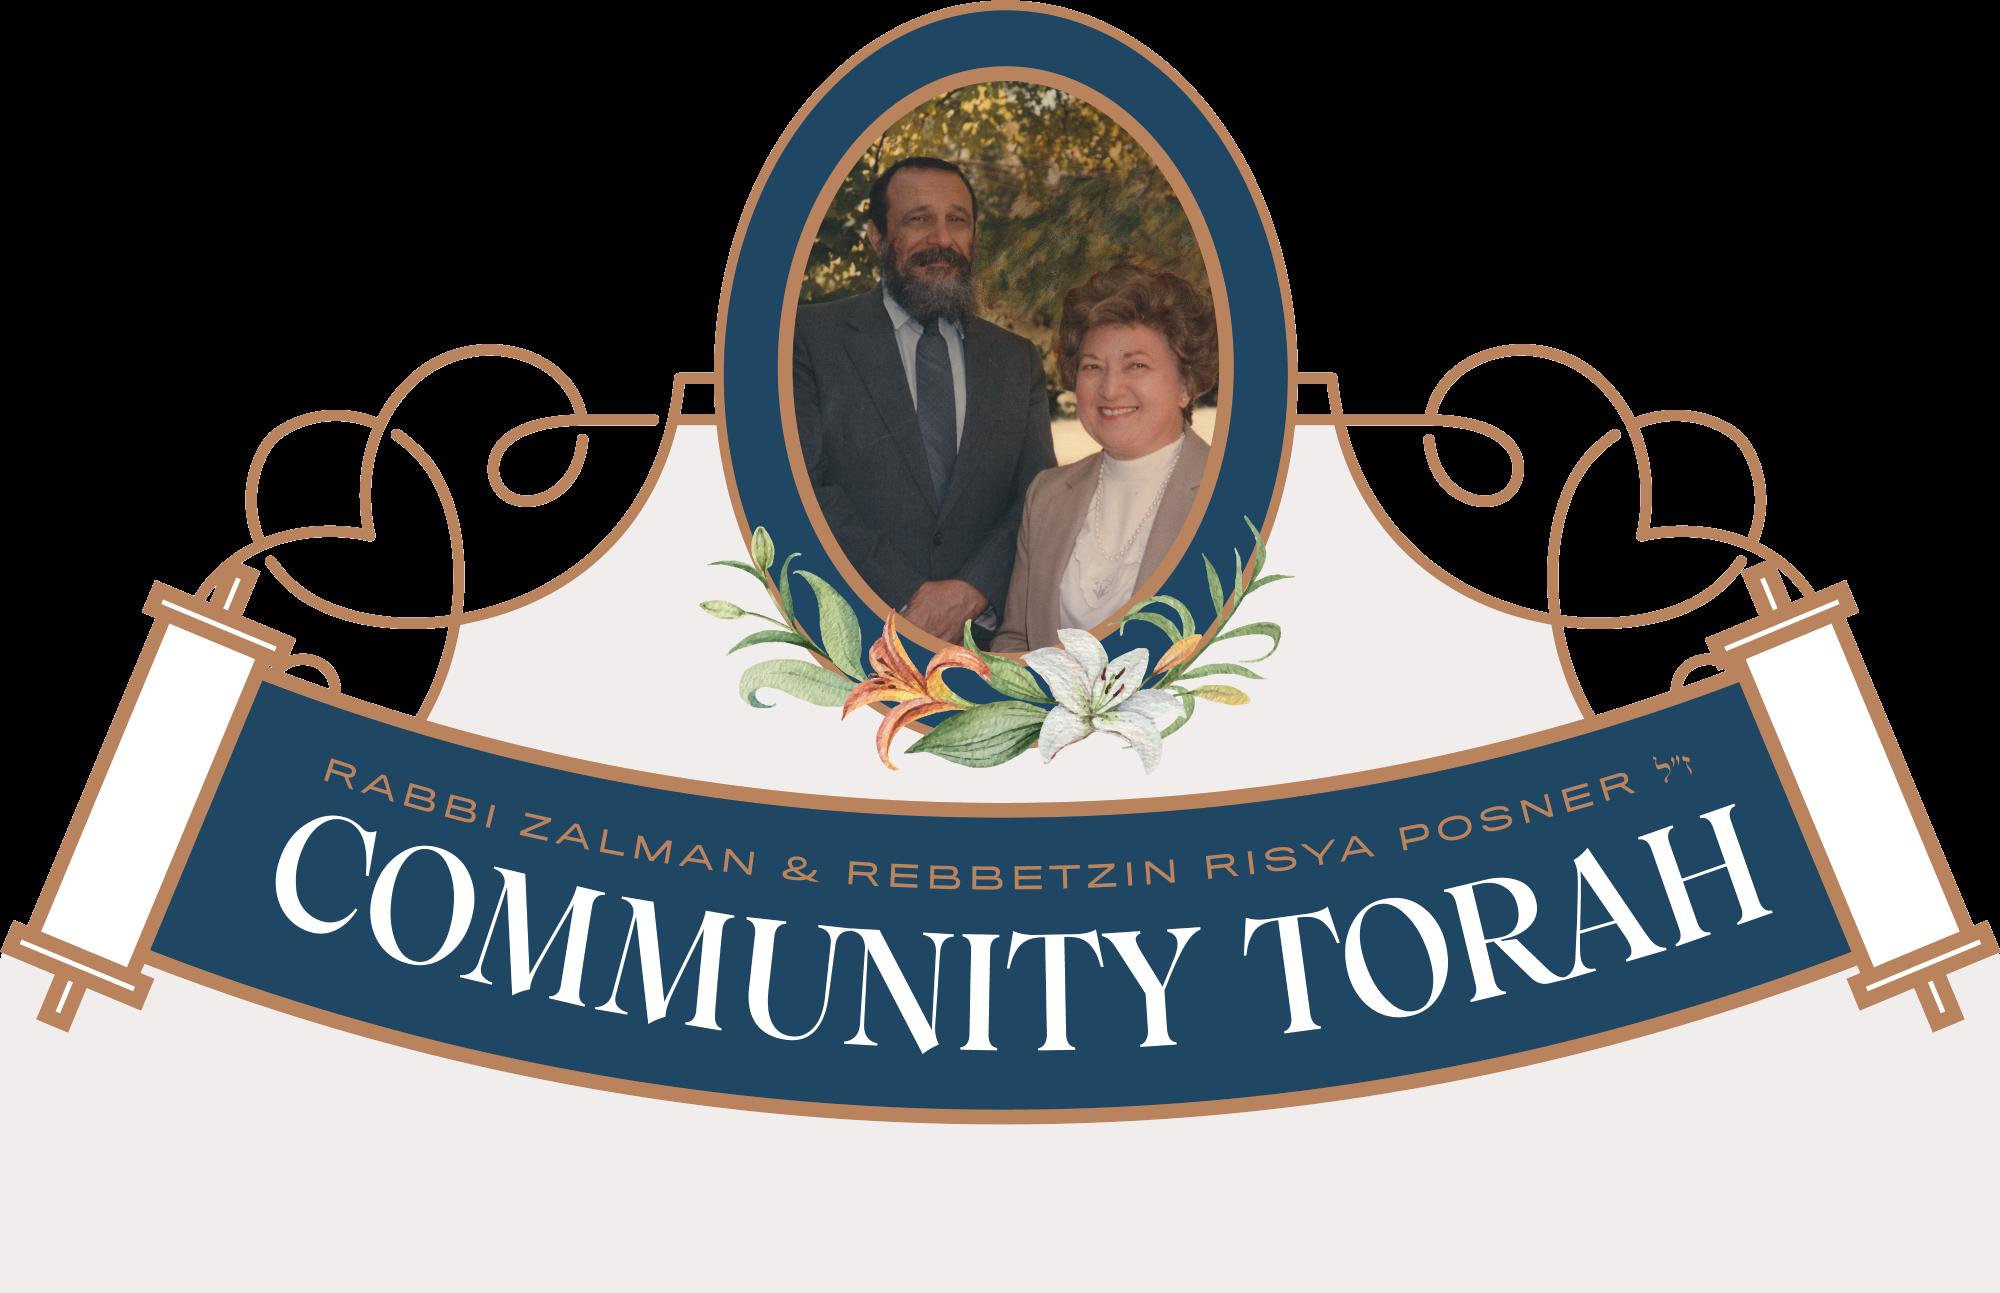 Posner Torah Campaign